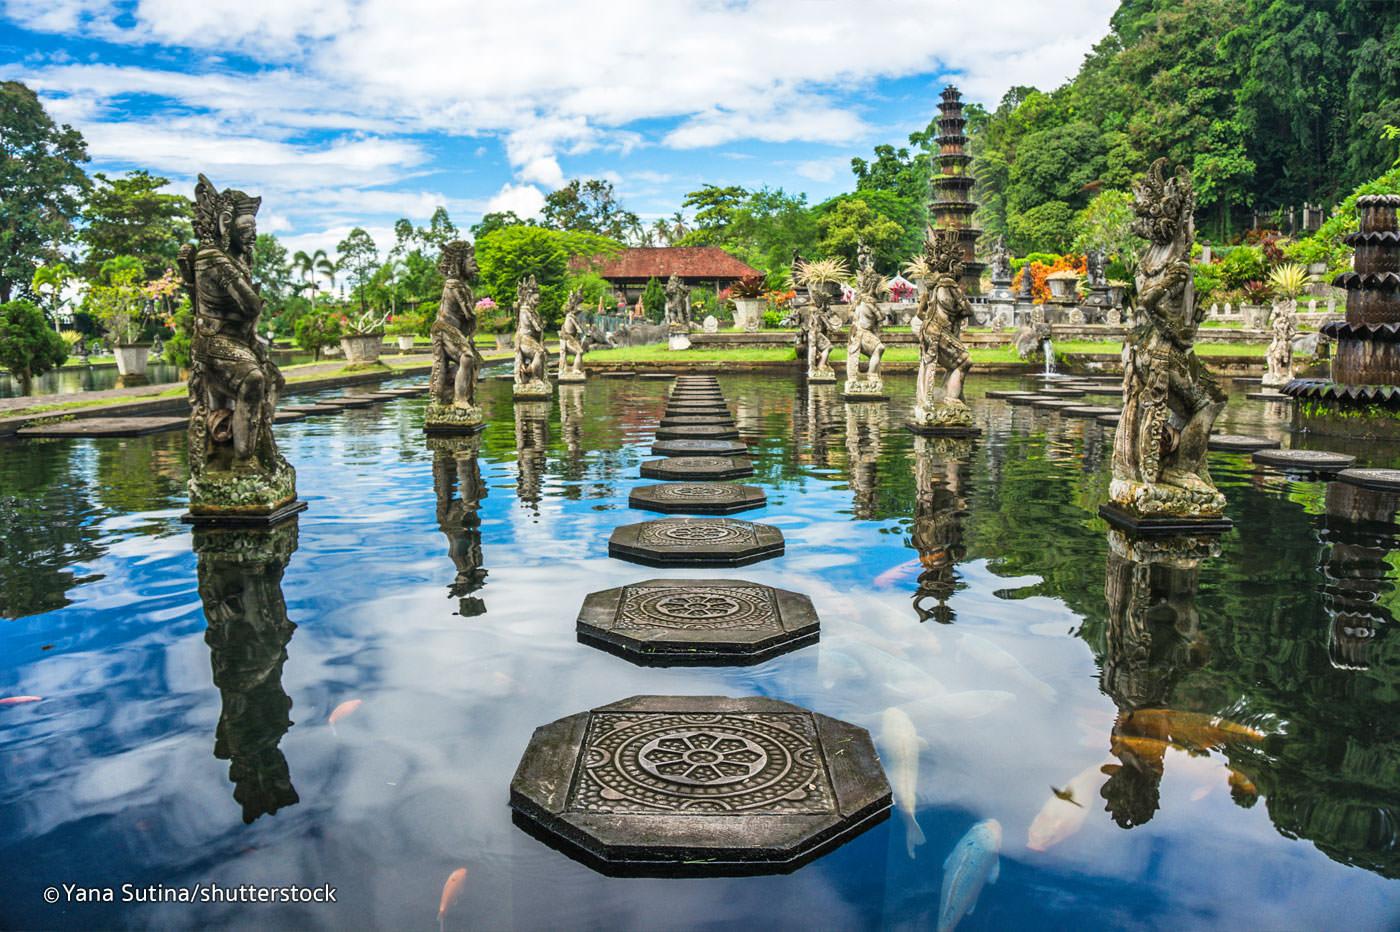 Pilihan Destinasi Wisata Bali Terbaru Ala Anak Millenial